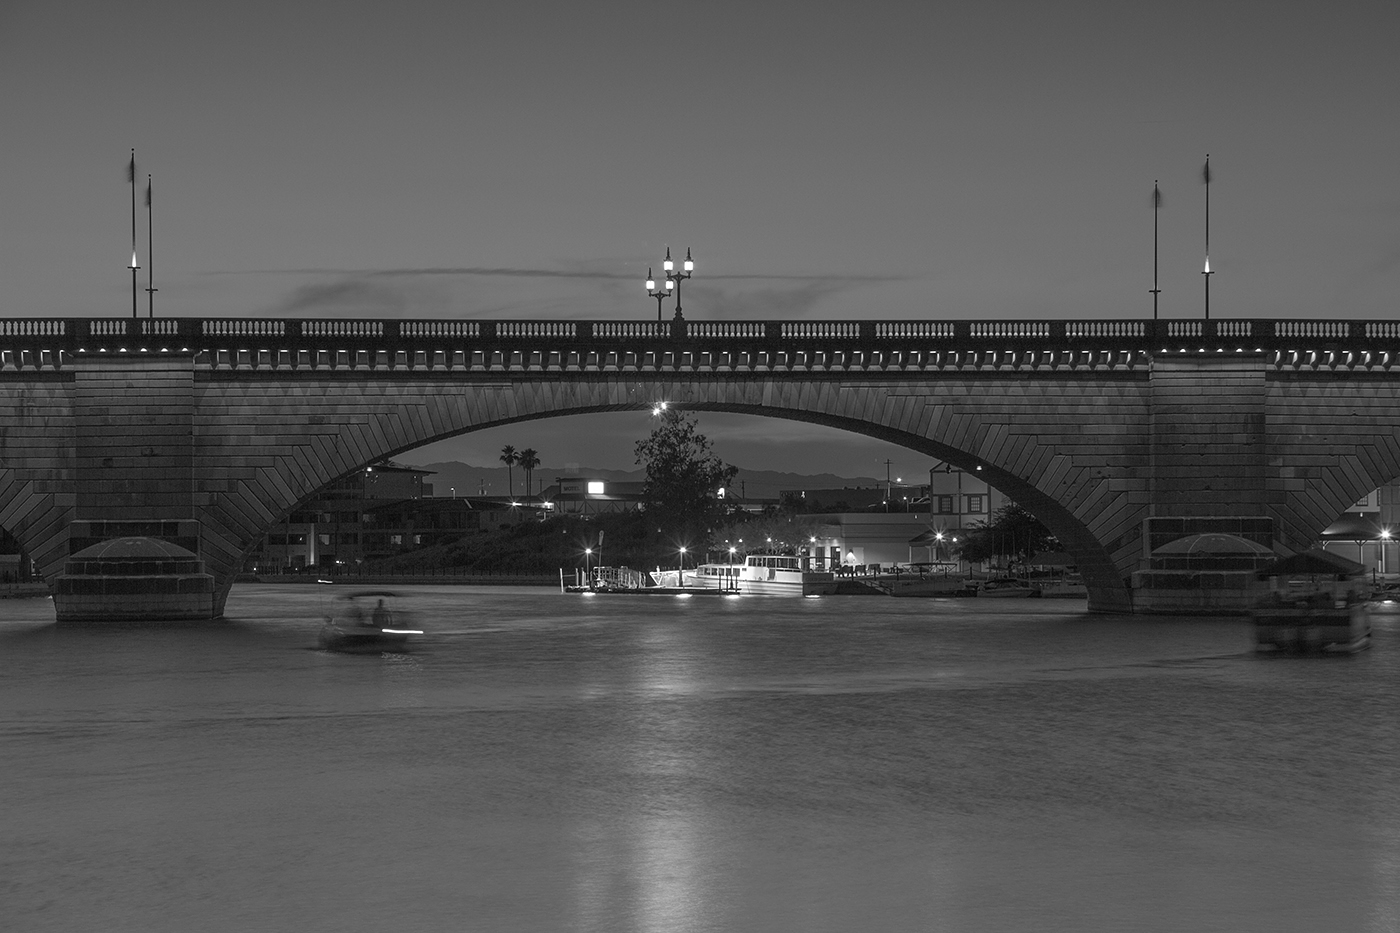 LONDON BRIDGE USA by Peter Morrish